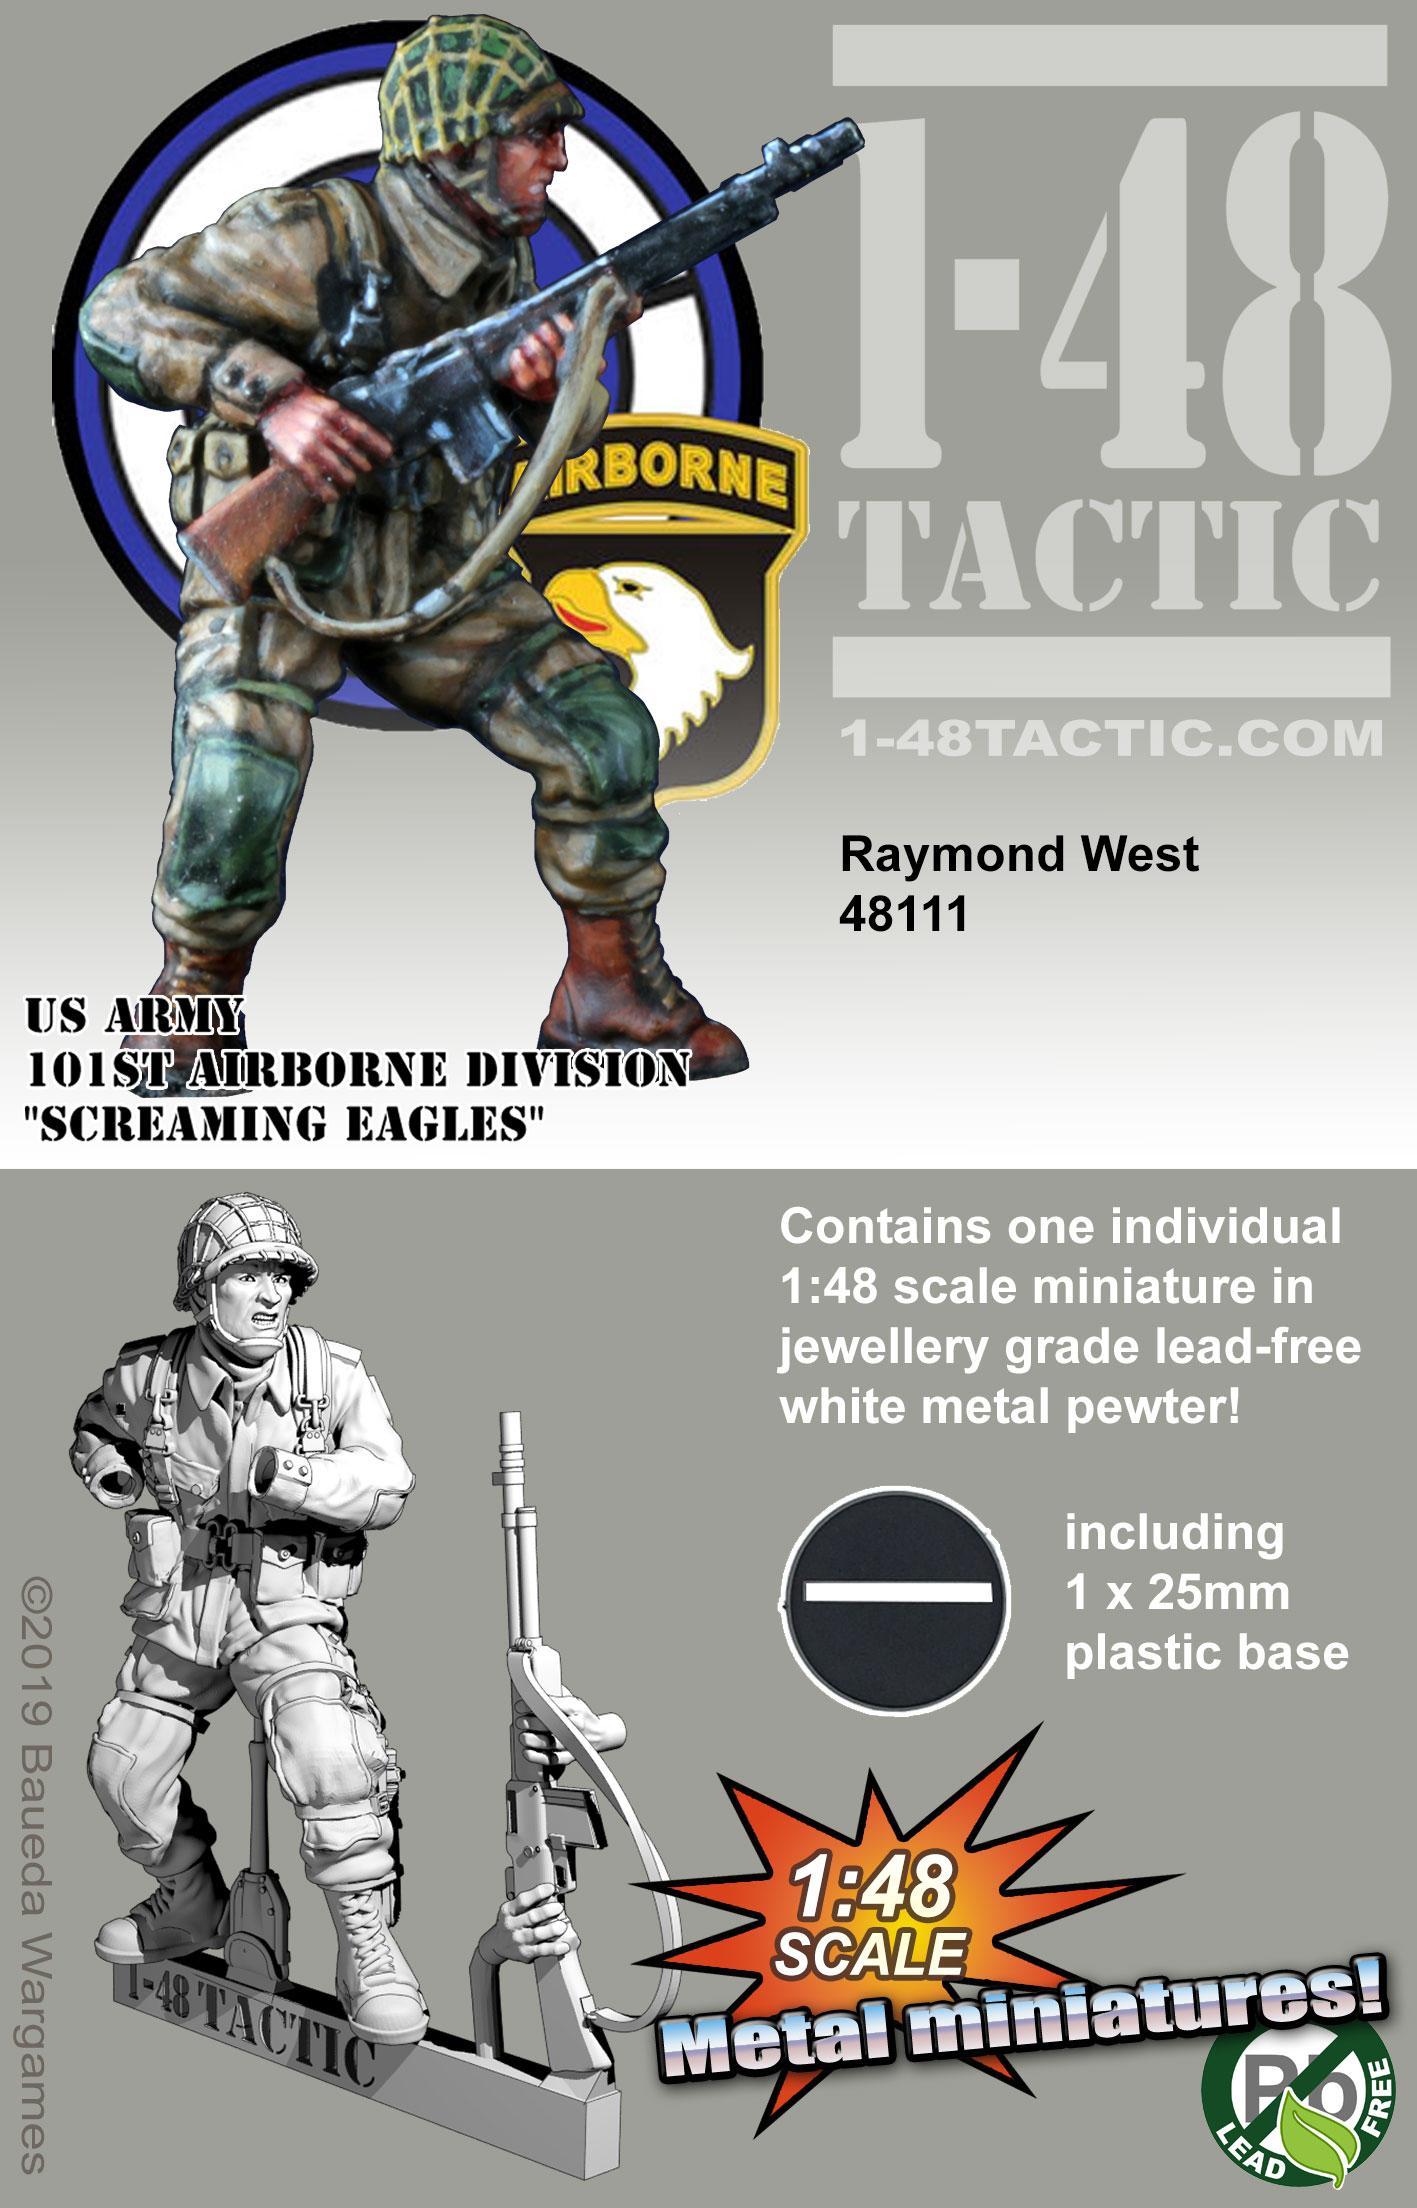 48111 Raymond (Ray) West BAR gunner 101st Airborne Division